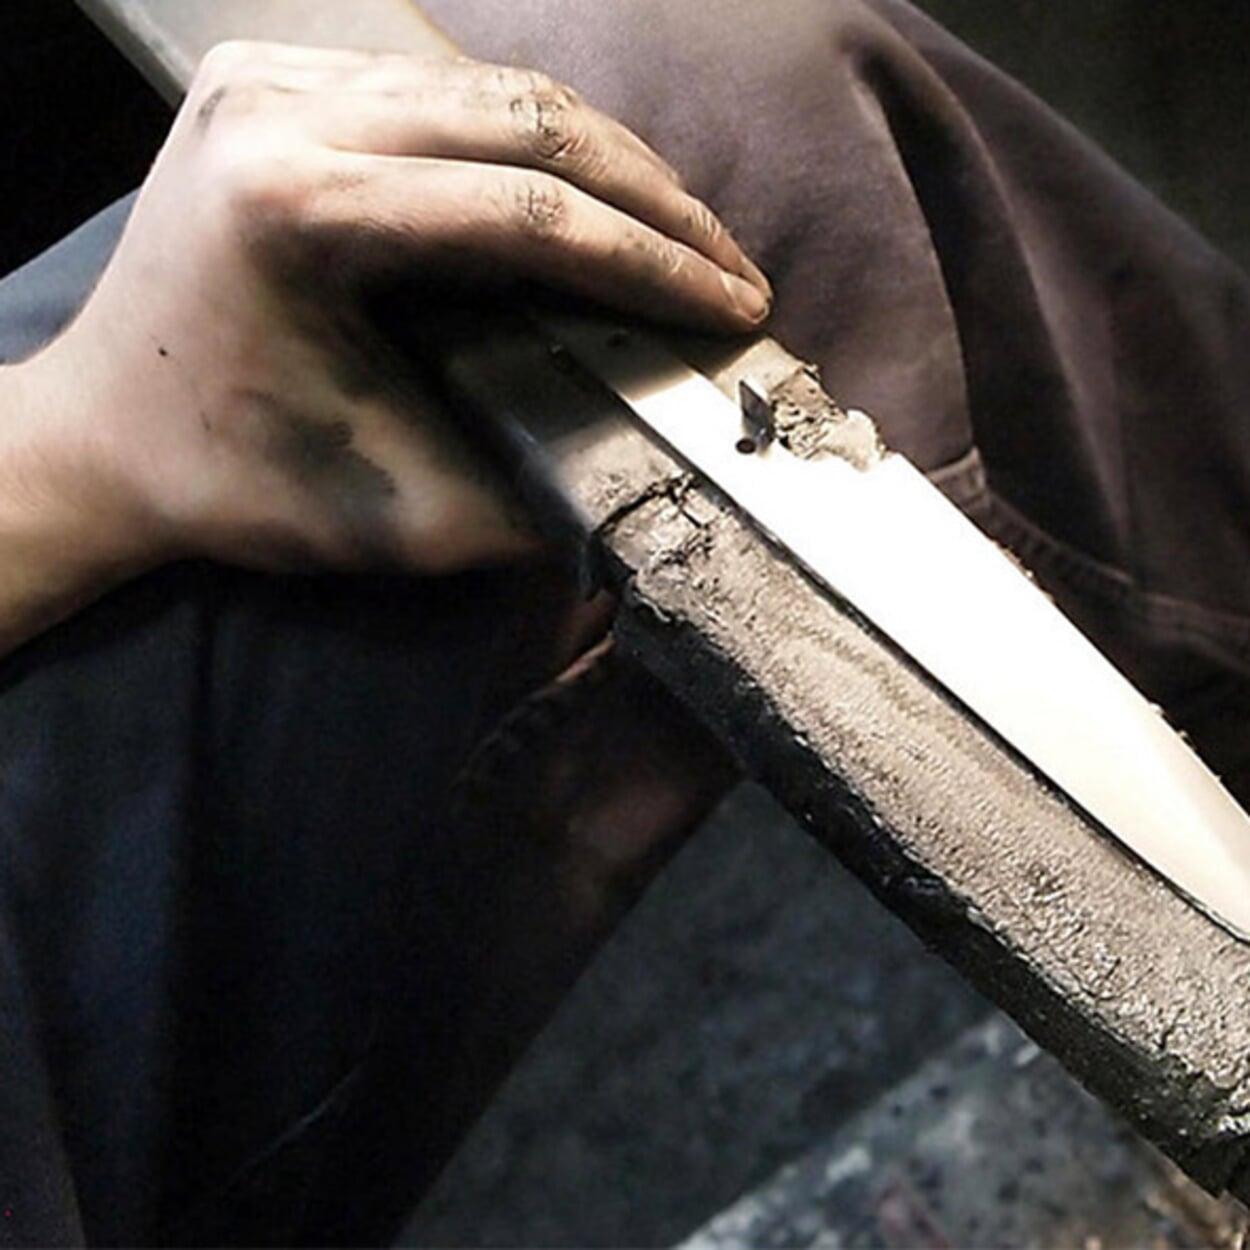 sharpening a kitchen knife on sharpening steel